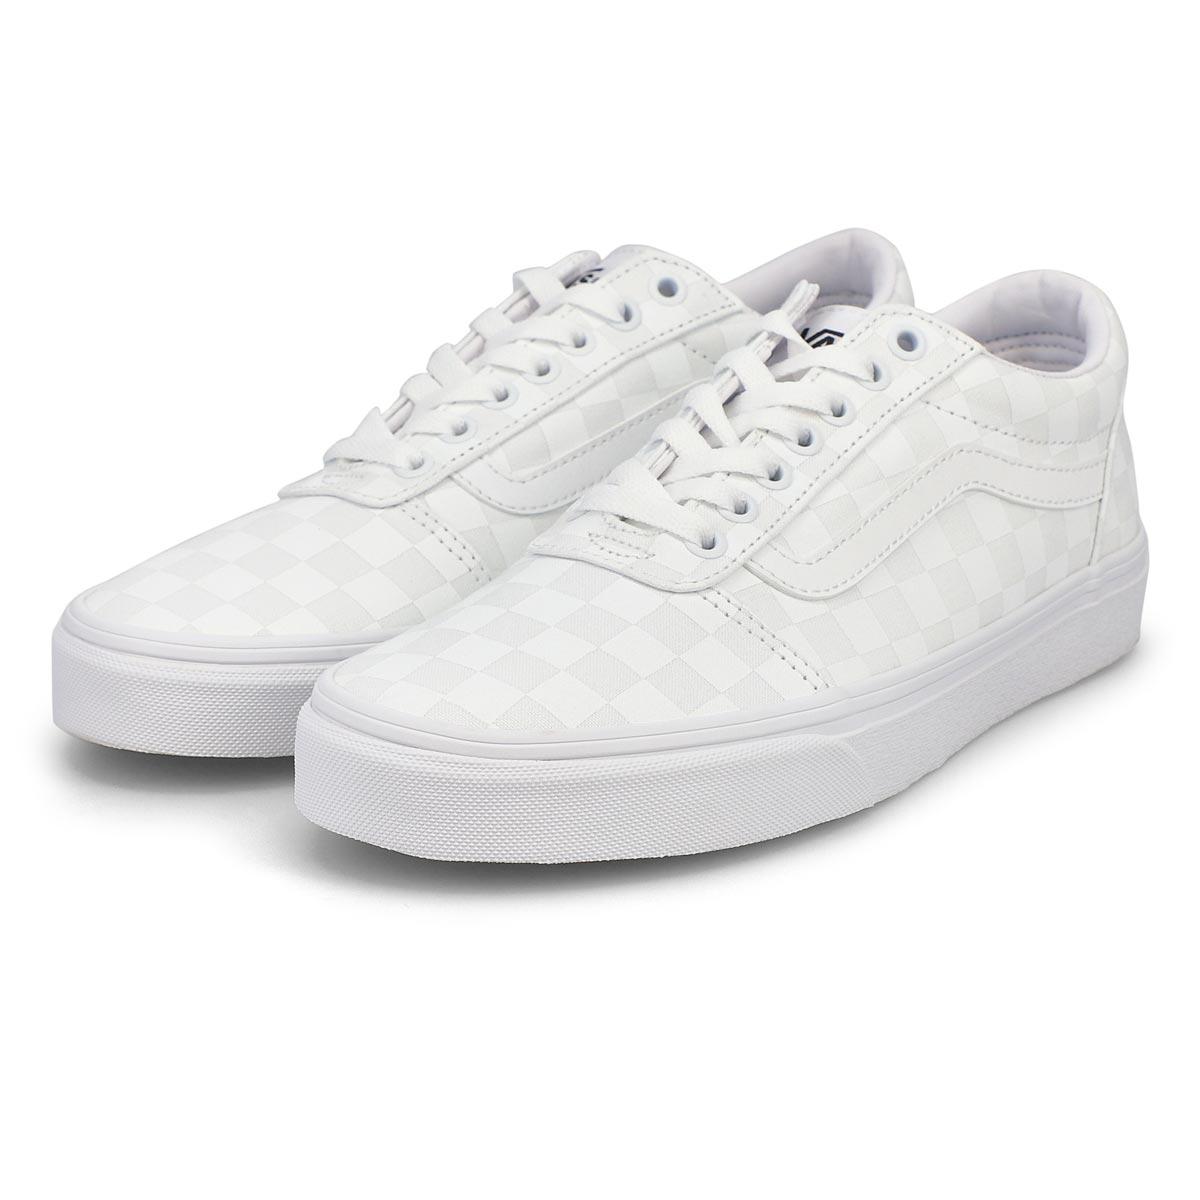 Men's Ward Sneaker - Checkered White/White